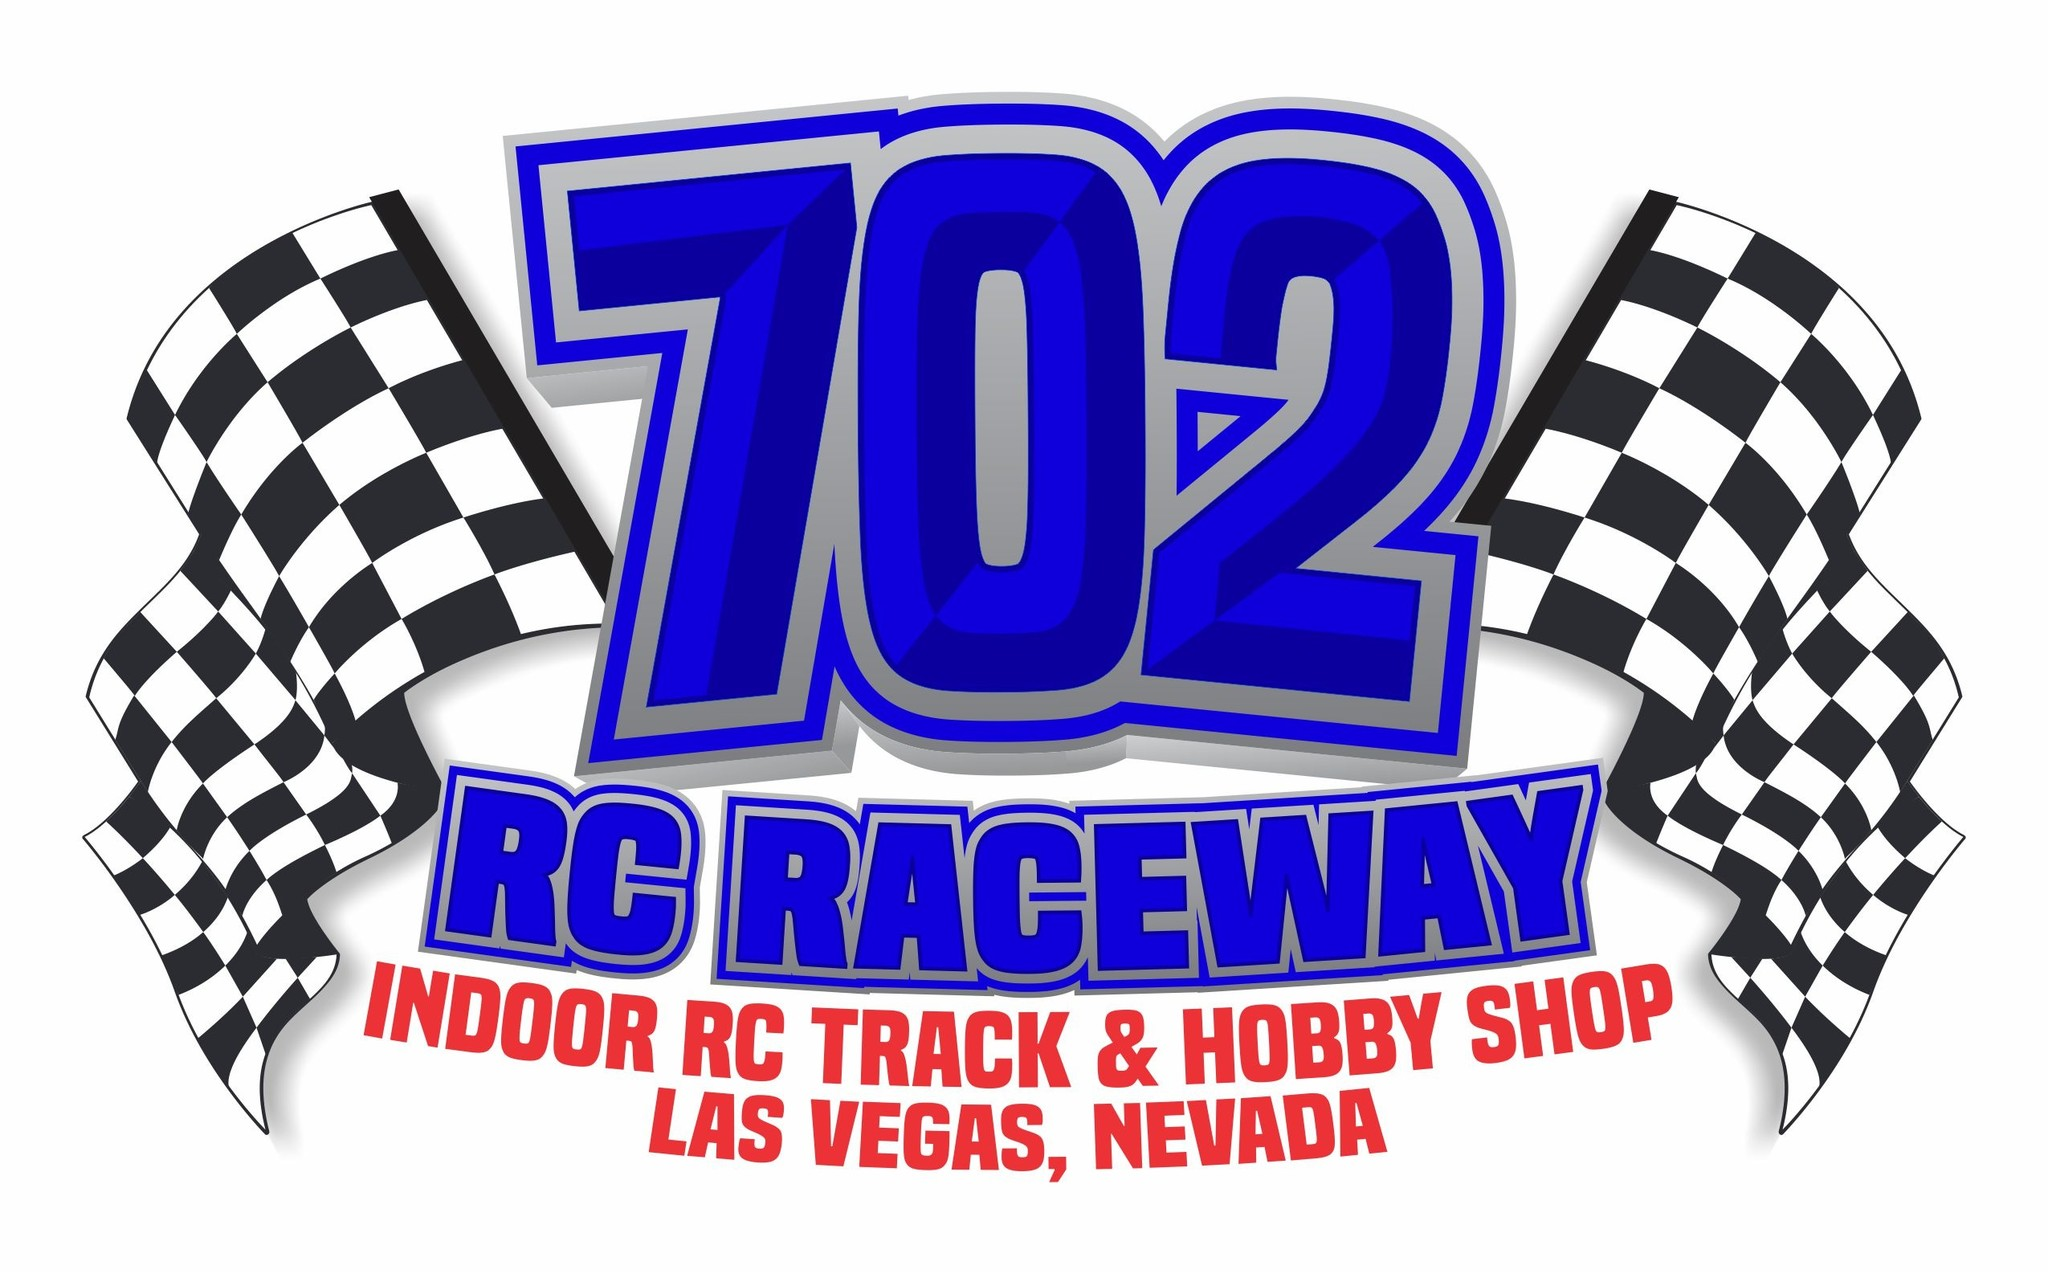 702 RC Raceway Track News: Week of Sep 29 – Oct 3